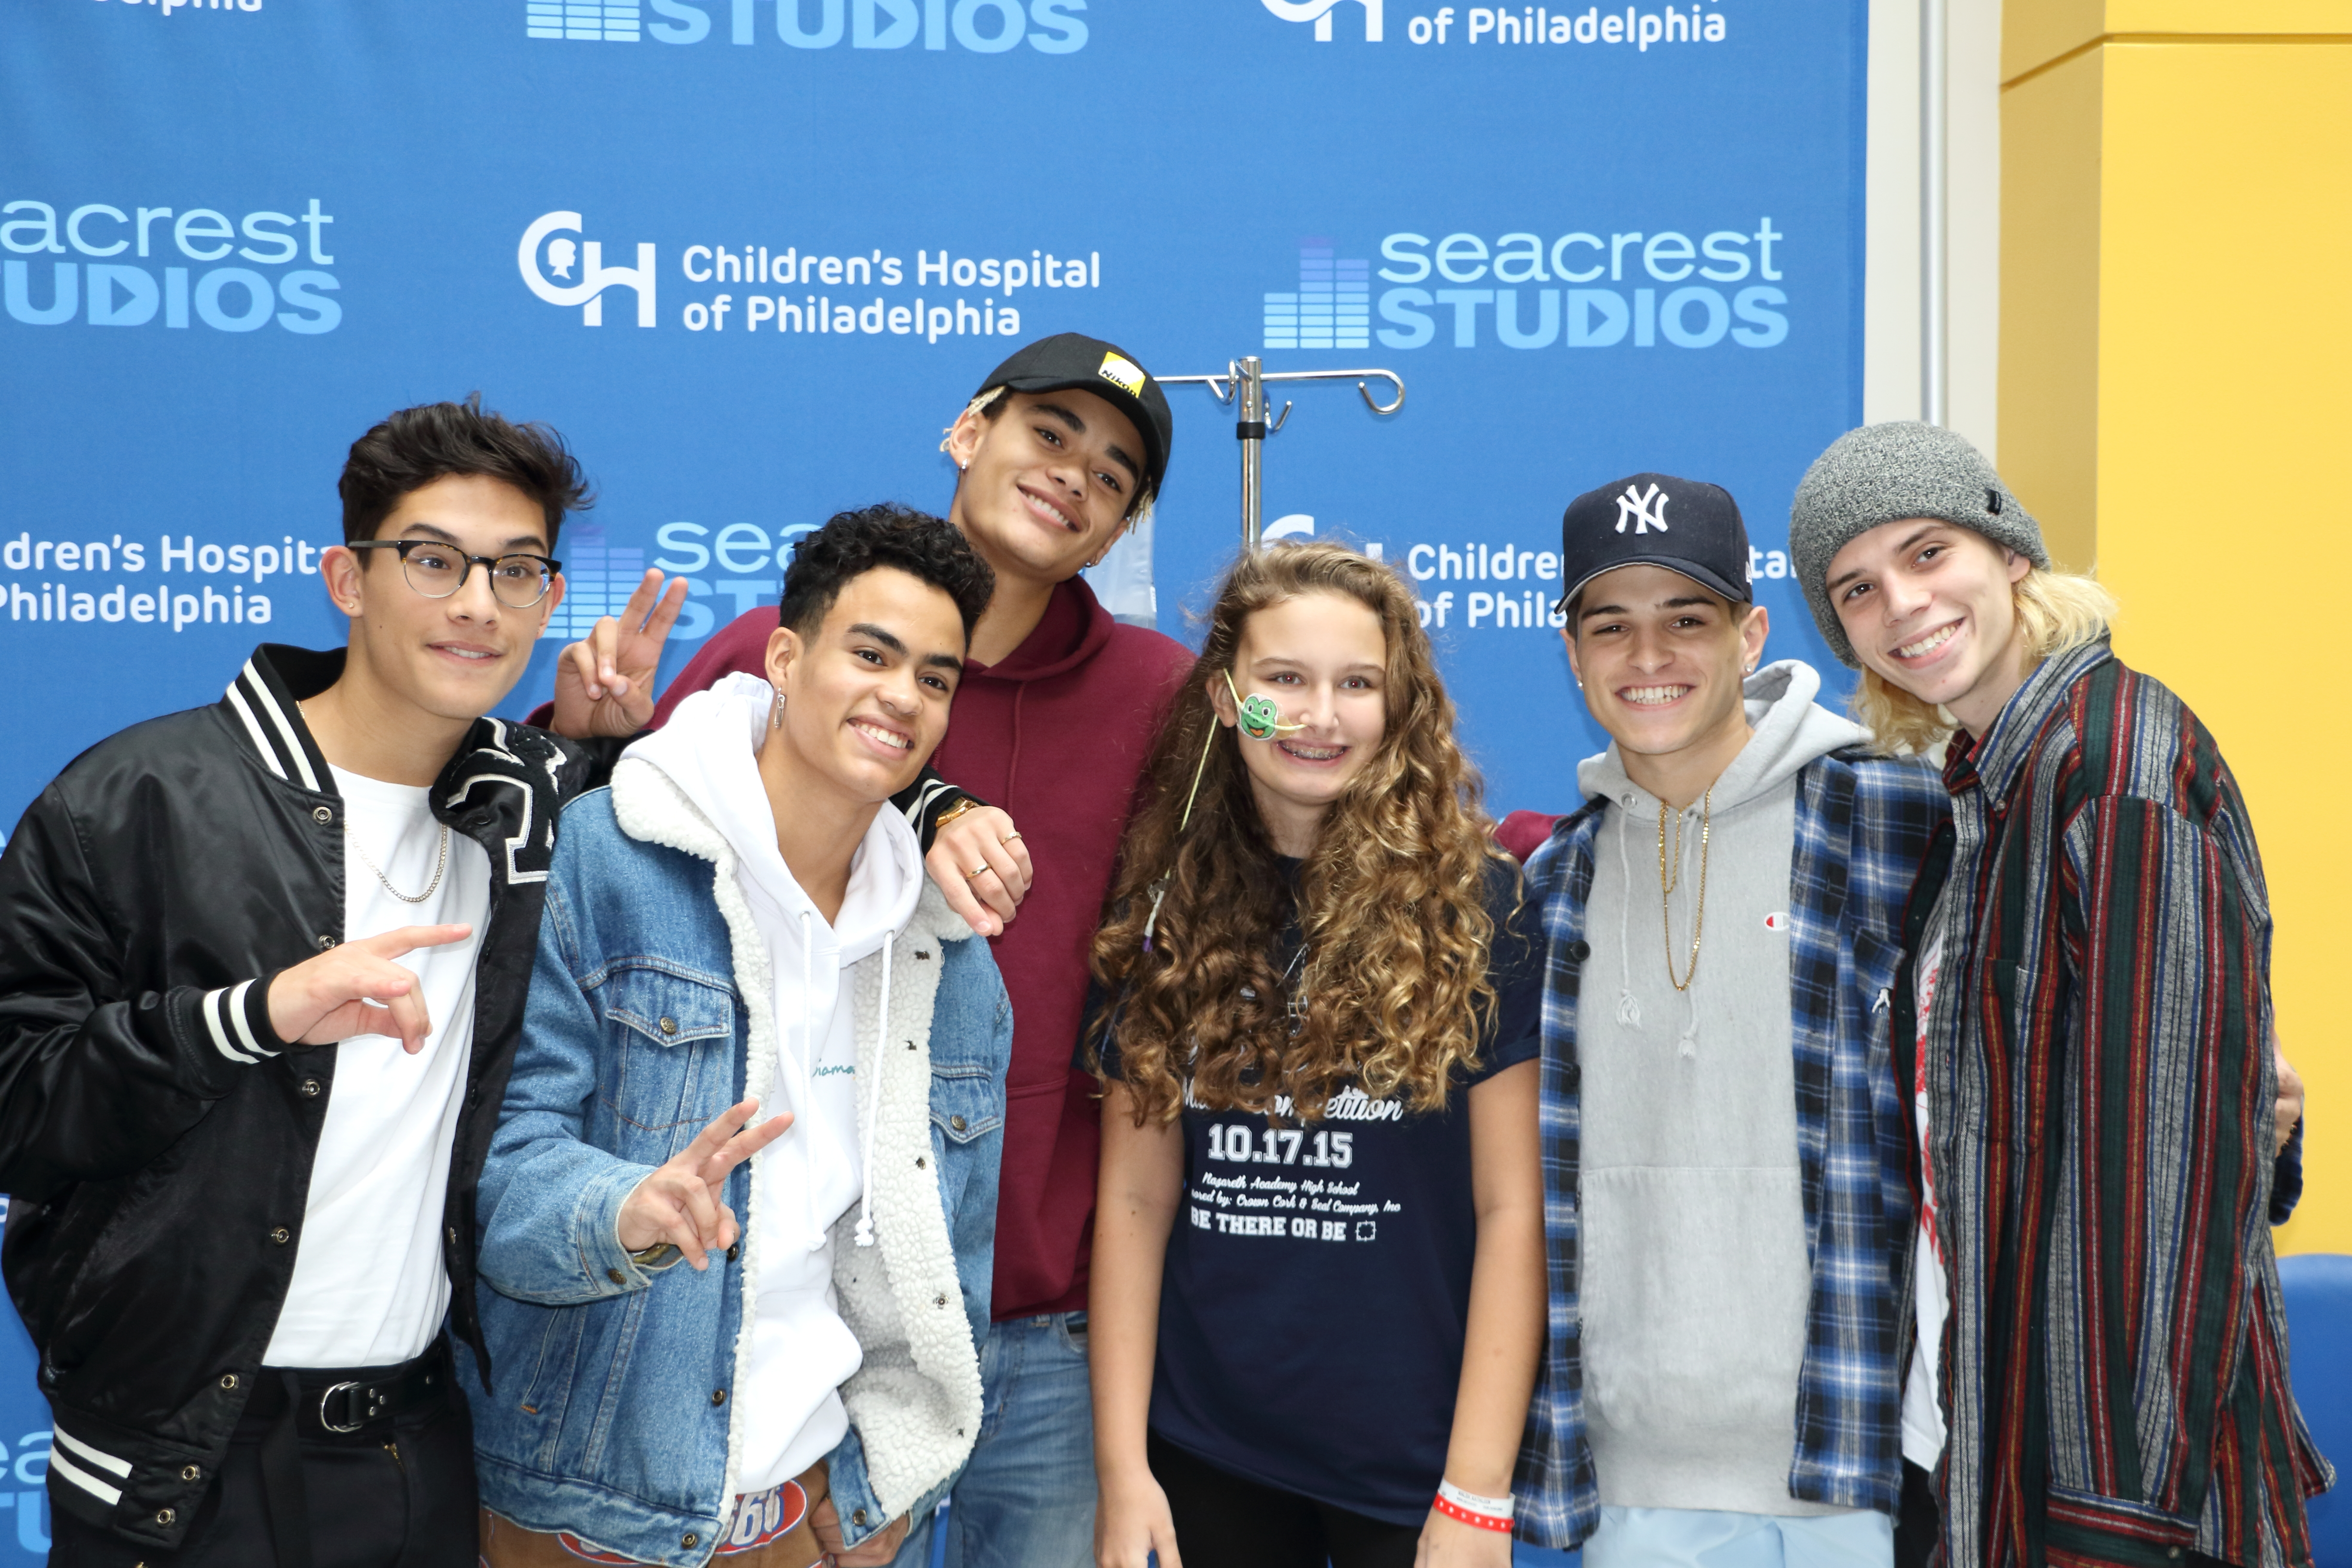 PRETTYMUCH Visits Seacrest Studios at Children's Hospital of Philadelphia